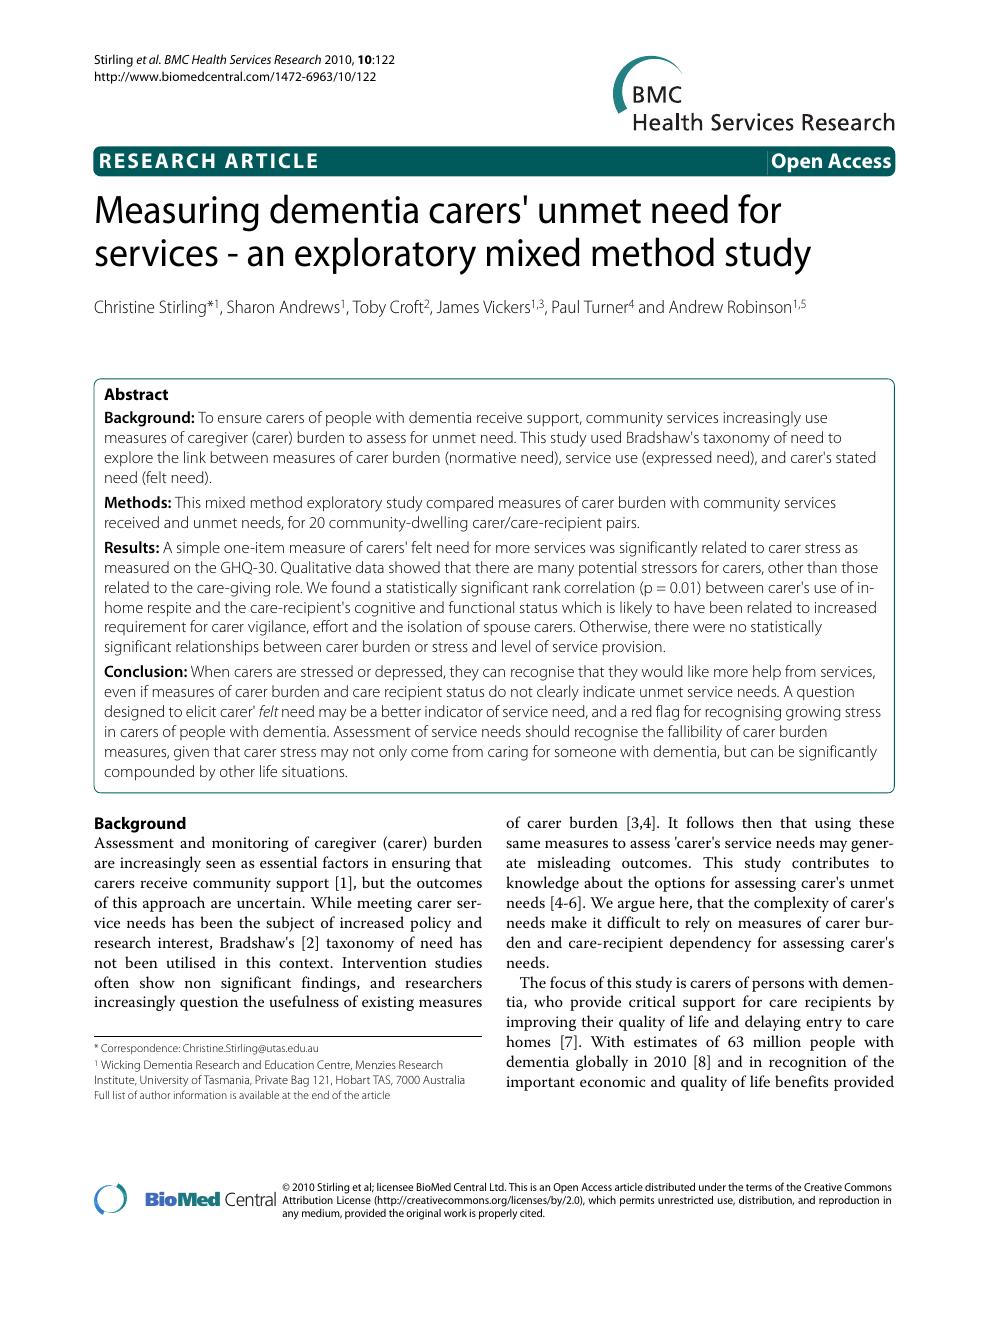 https://resourcecentre.savethechildren.net/node/10326/pdf/pdak_case_management_guidelines-final.pdf